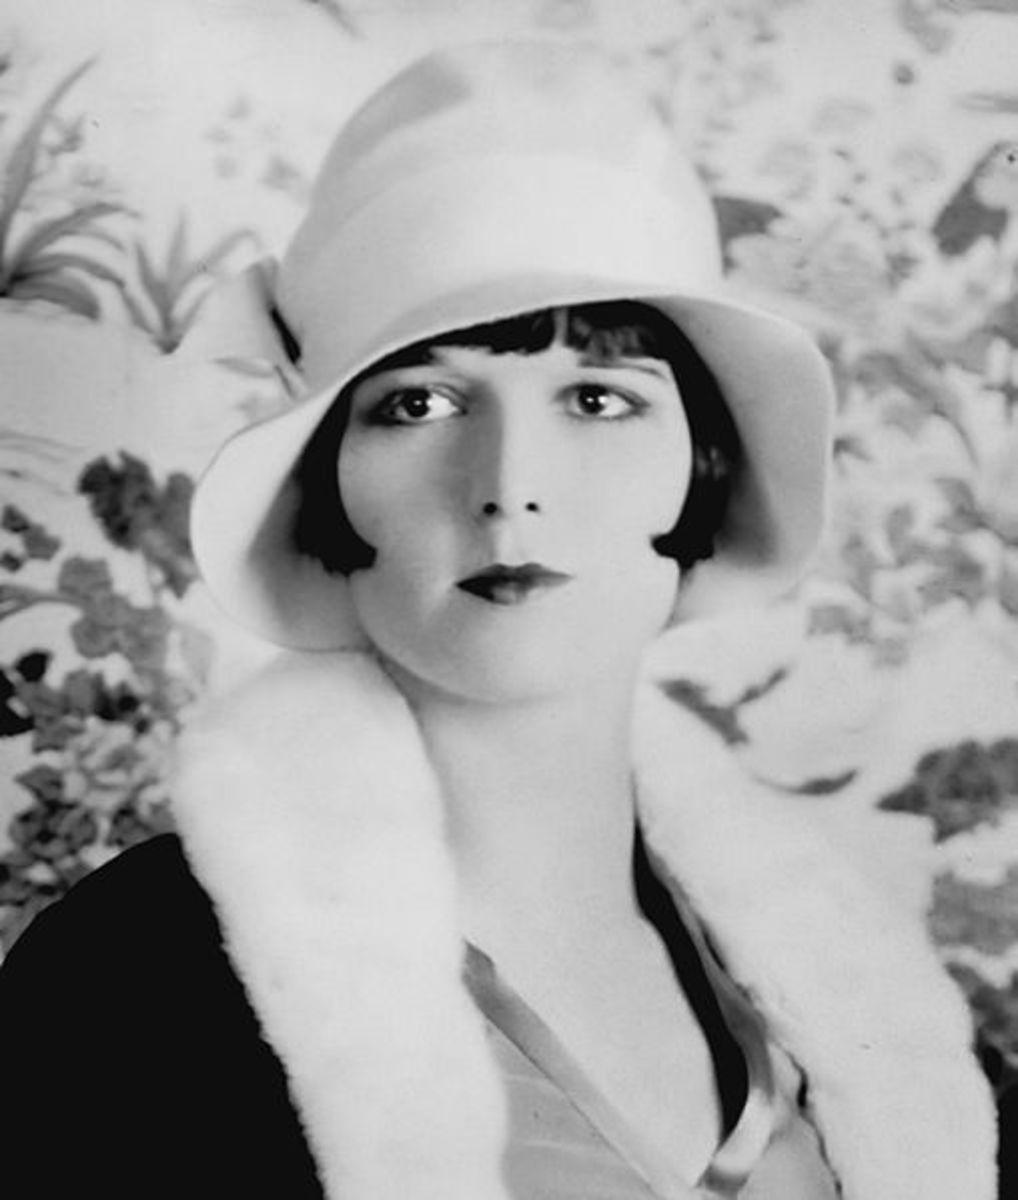 Louise Brooks circa 1926, wearing the bob hair style